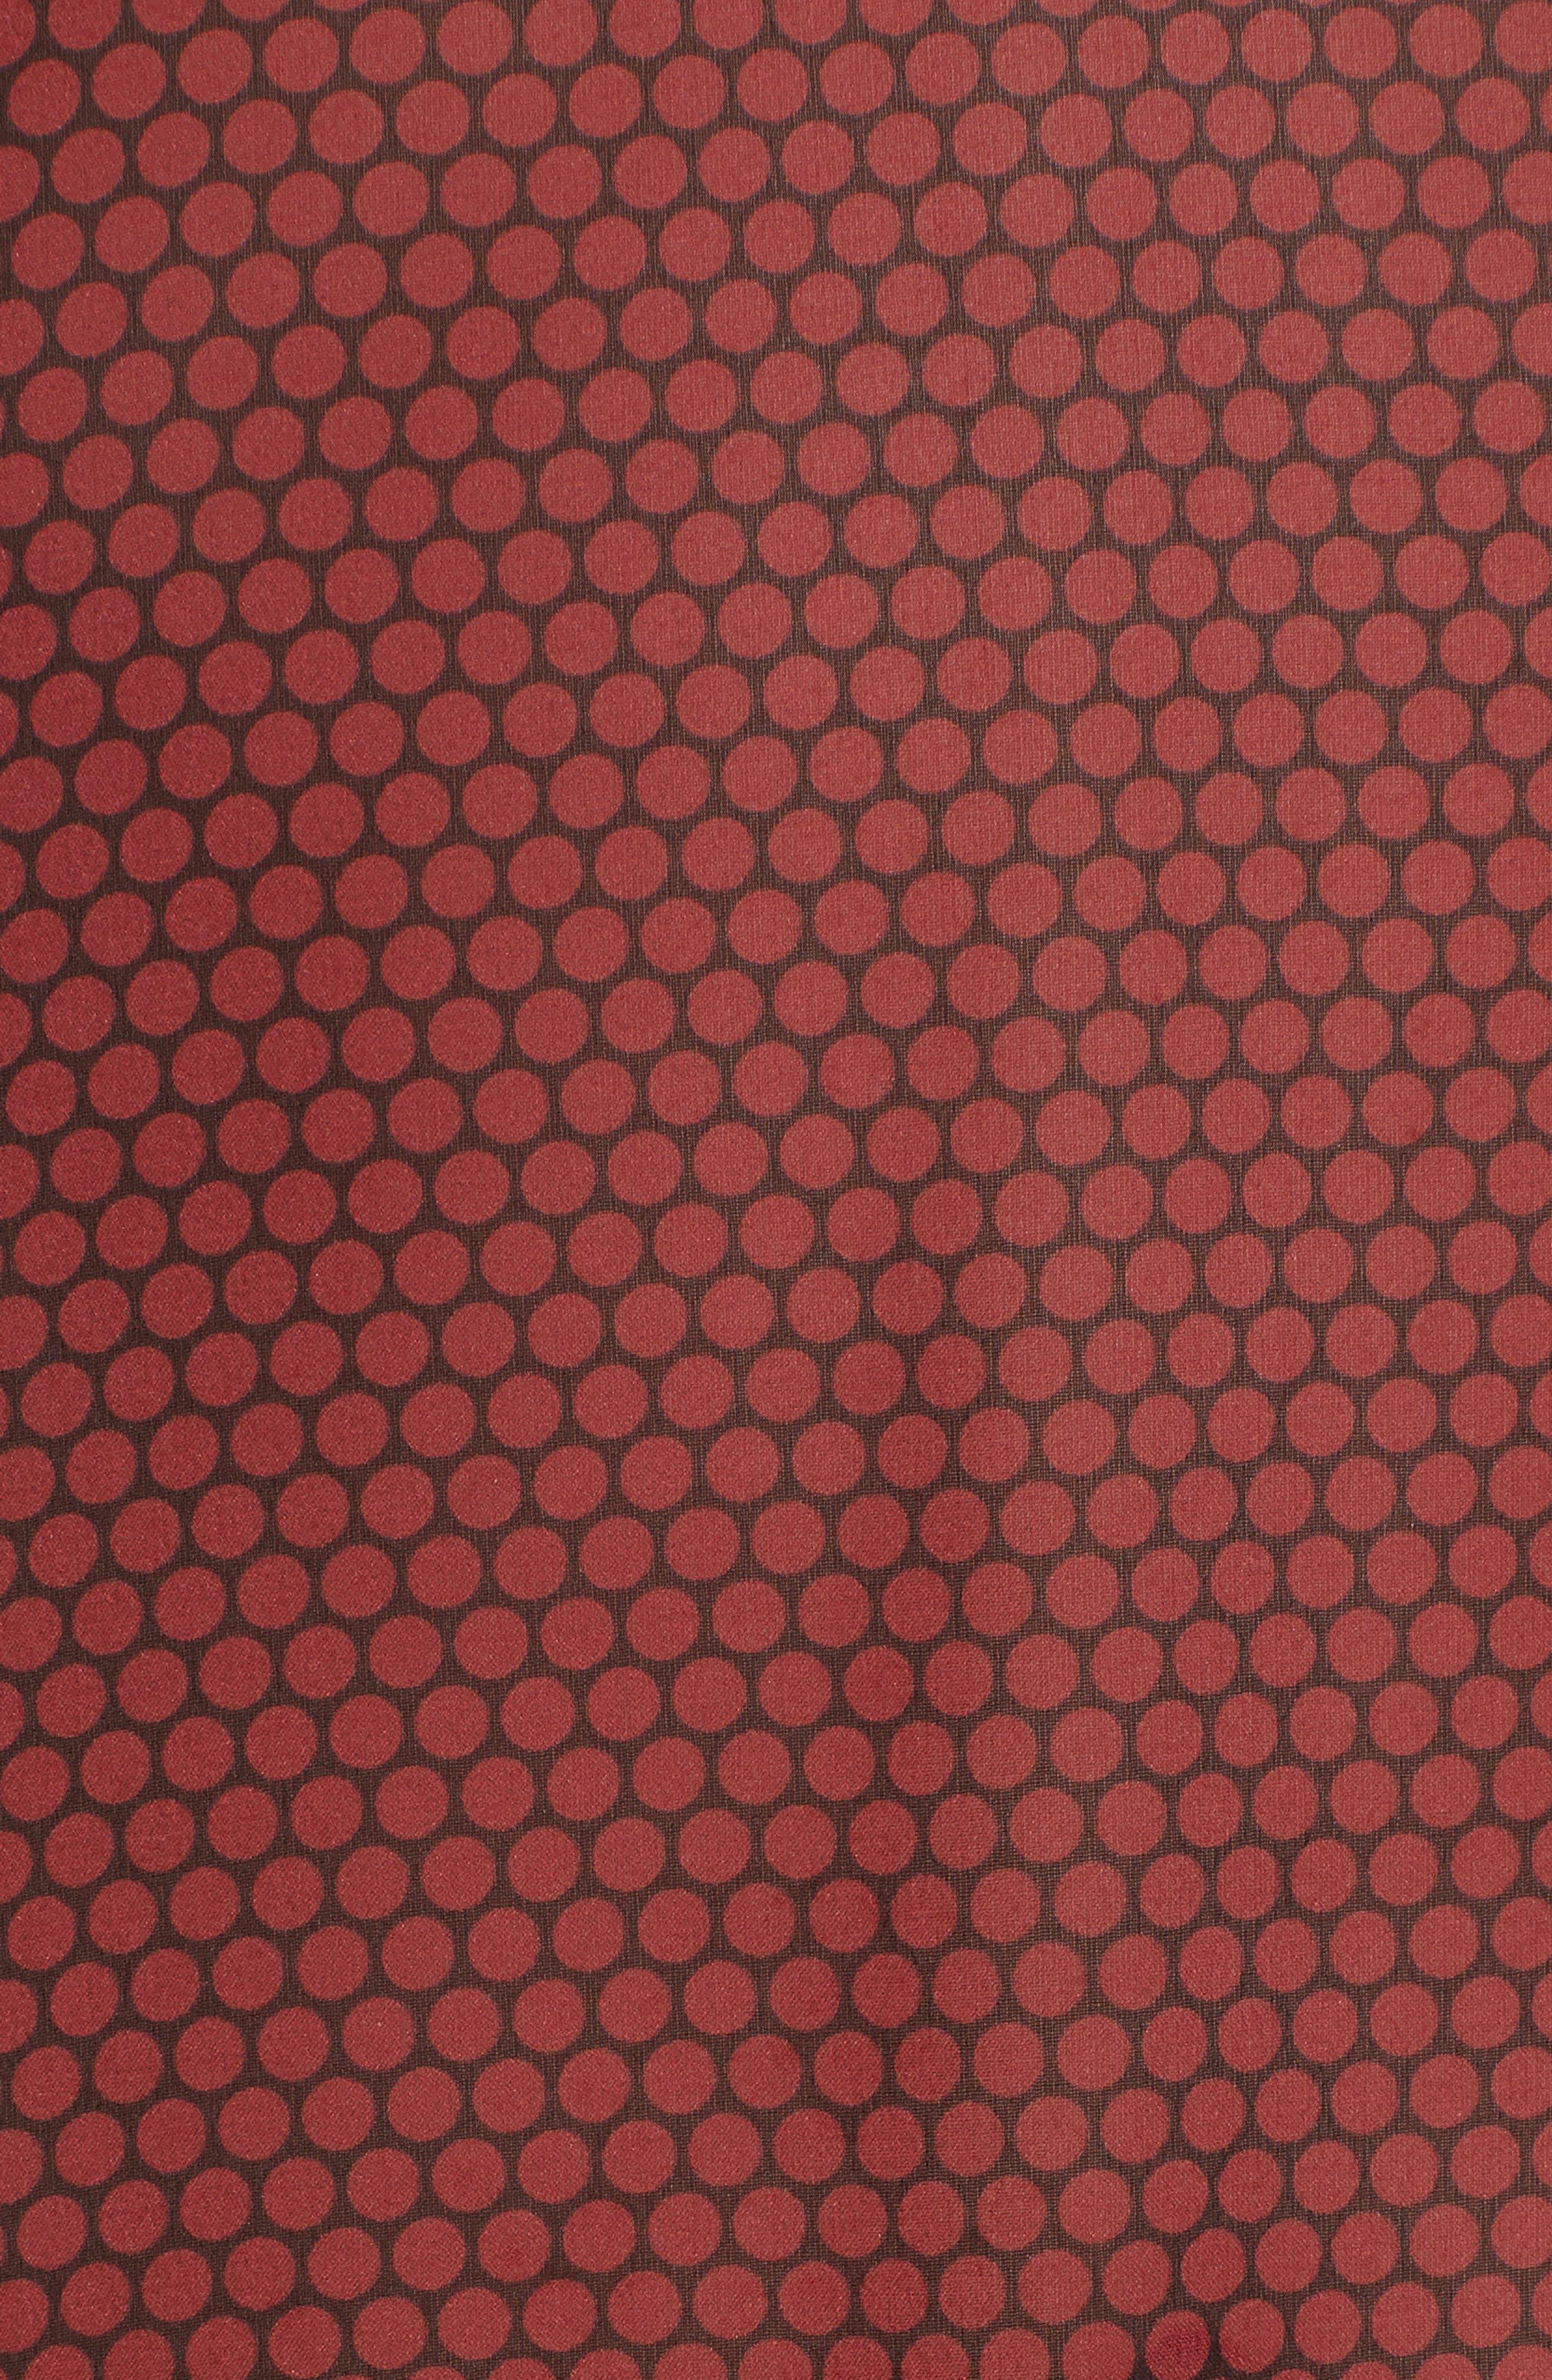 Dot Silk Chiffon Shell,                             Alternate thumbnail 5, color,                             BLACK/ MULBERRY